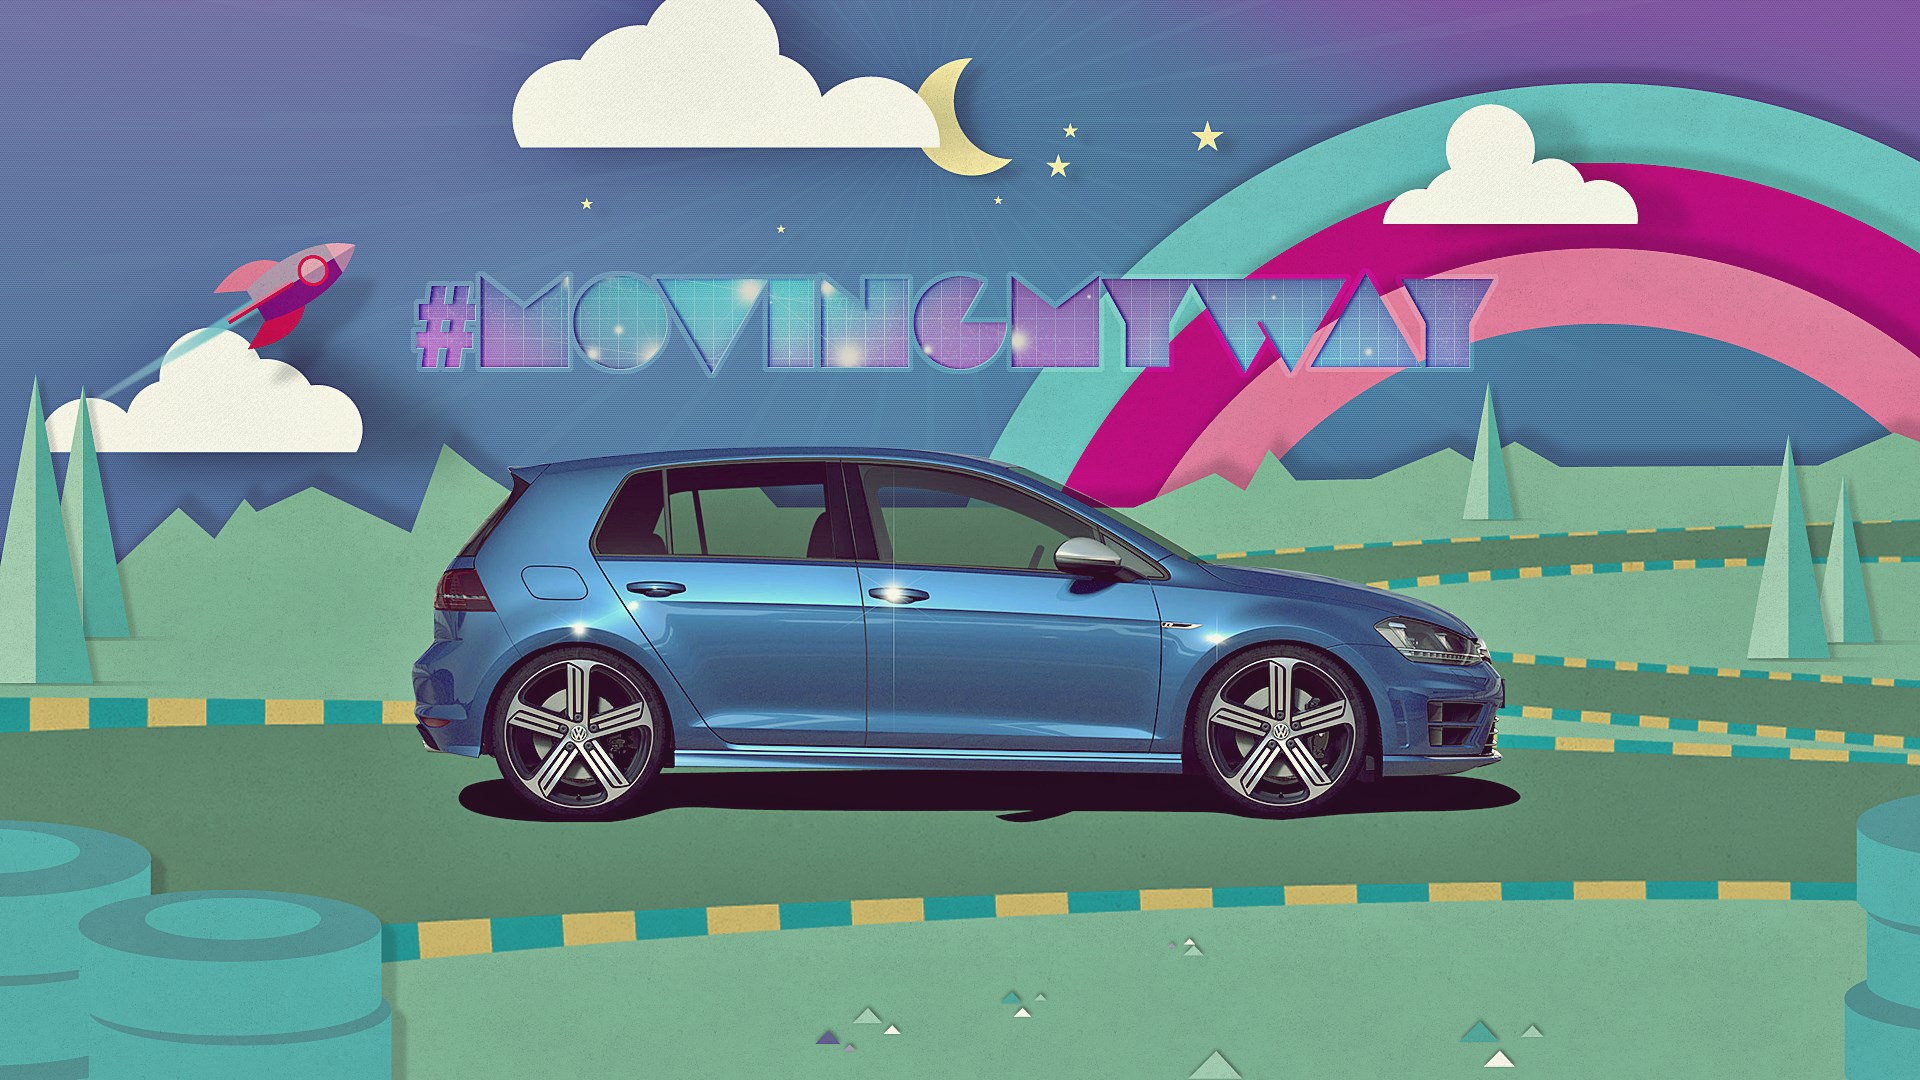 movingmyway-europcar-gewinnspiel-golf-r